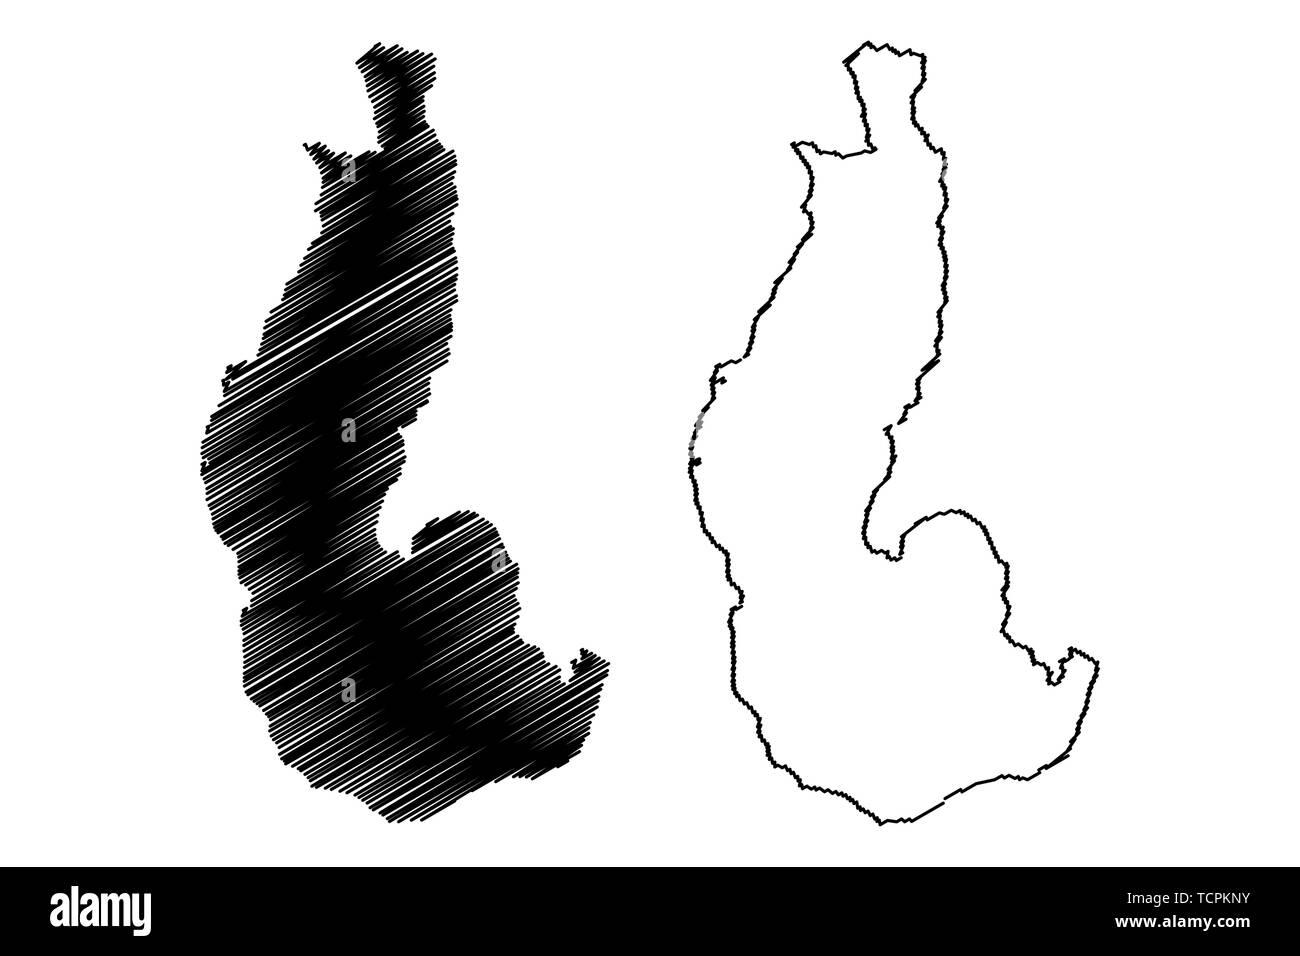 Toliara Province (Provinces of Madagascar, Republic of ...